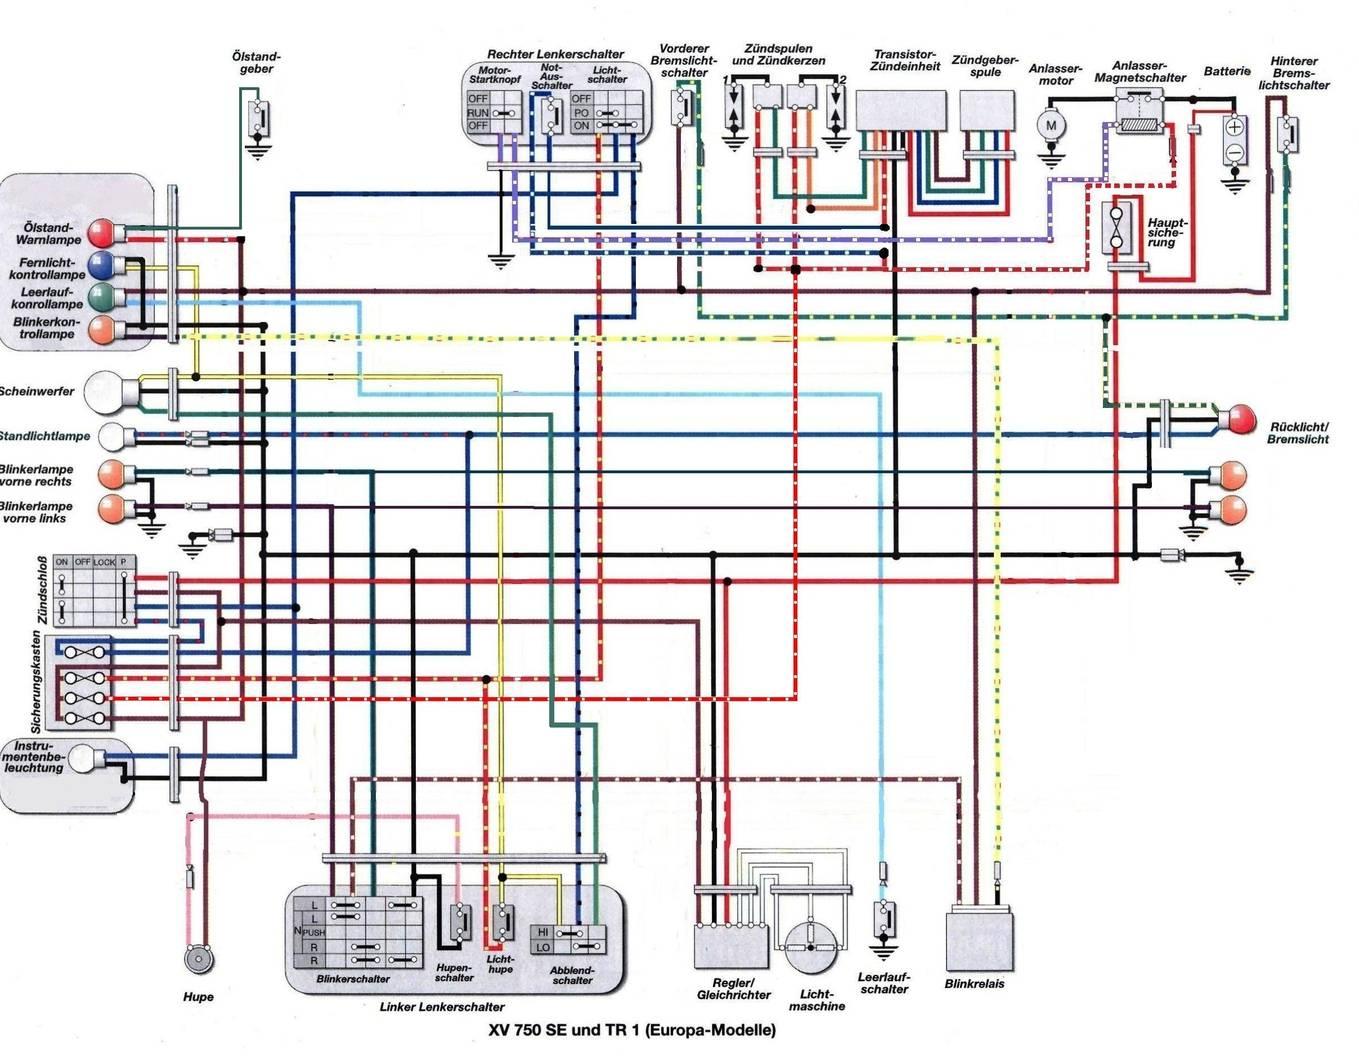 1982 Xv750 Wiring Diagram